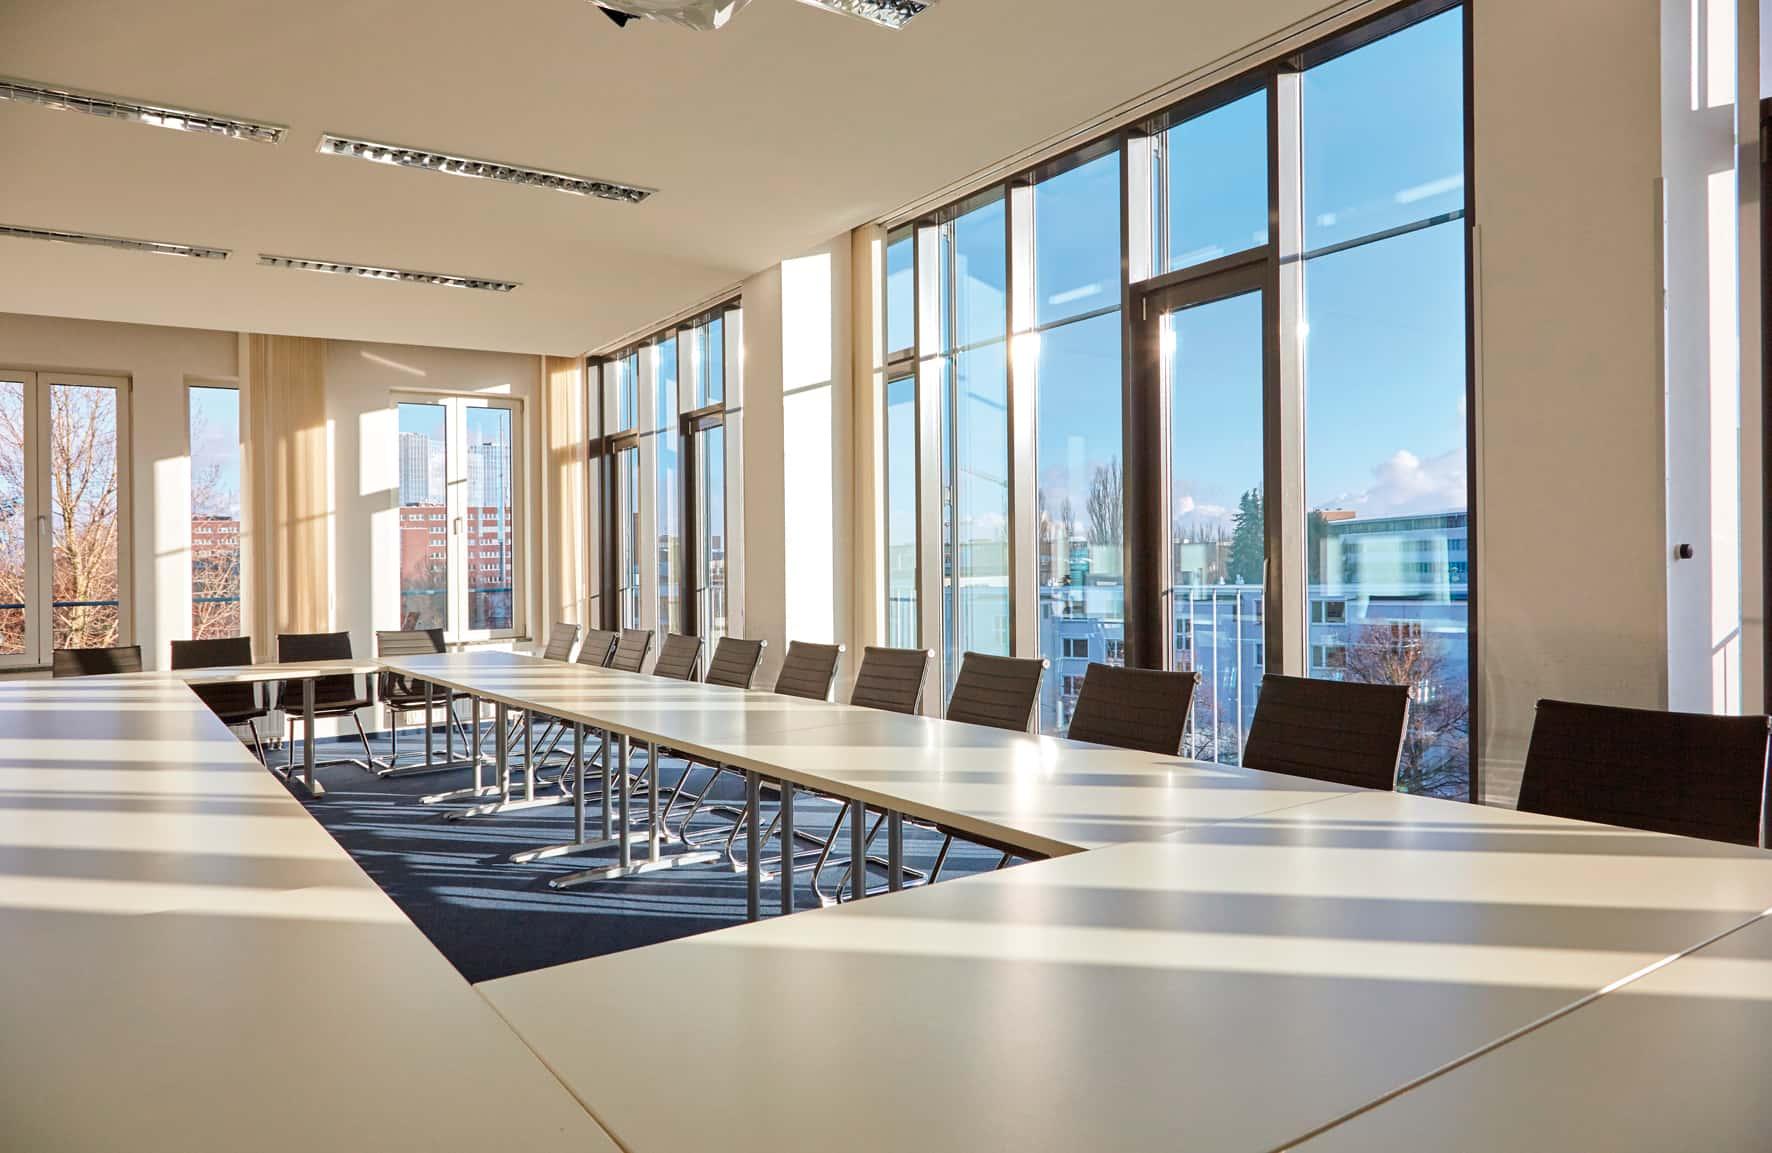 Seminarraum 1   itb - Institut für Training und Beratung in Hamburg